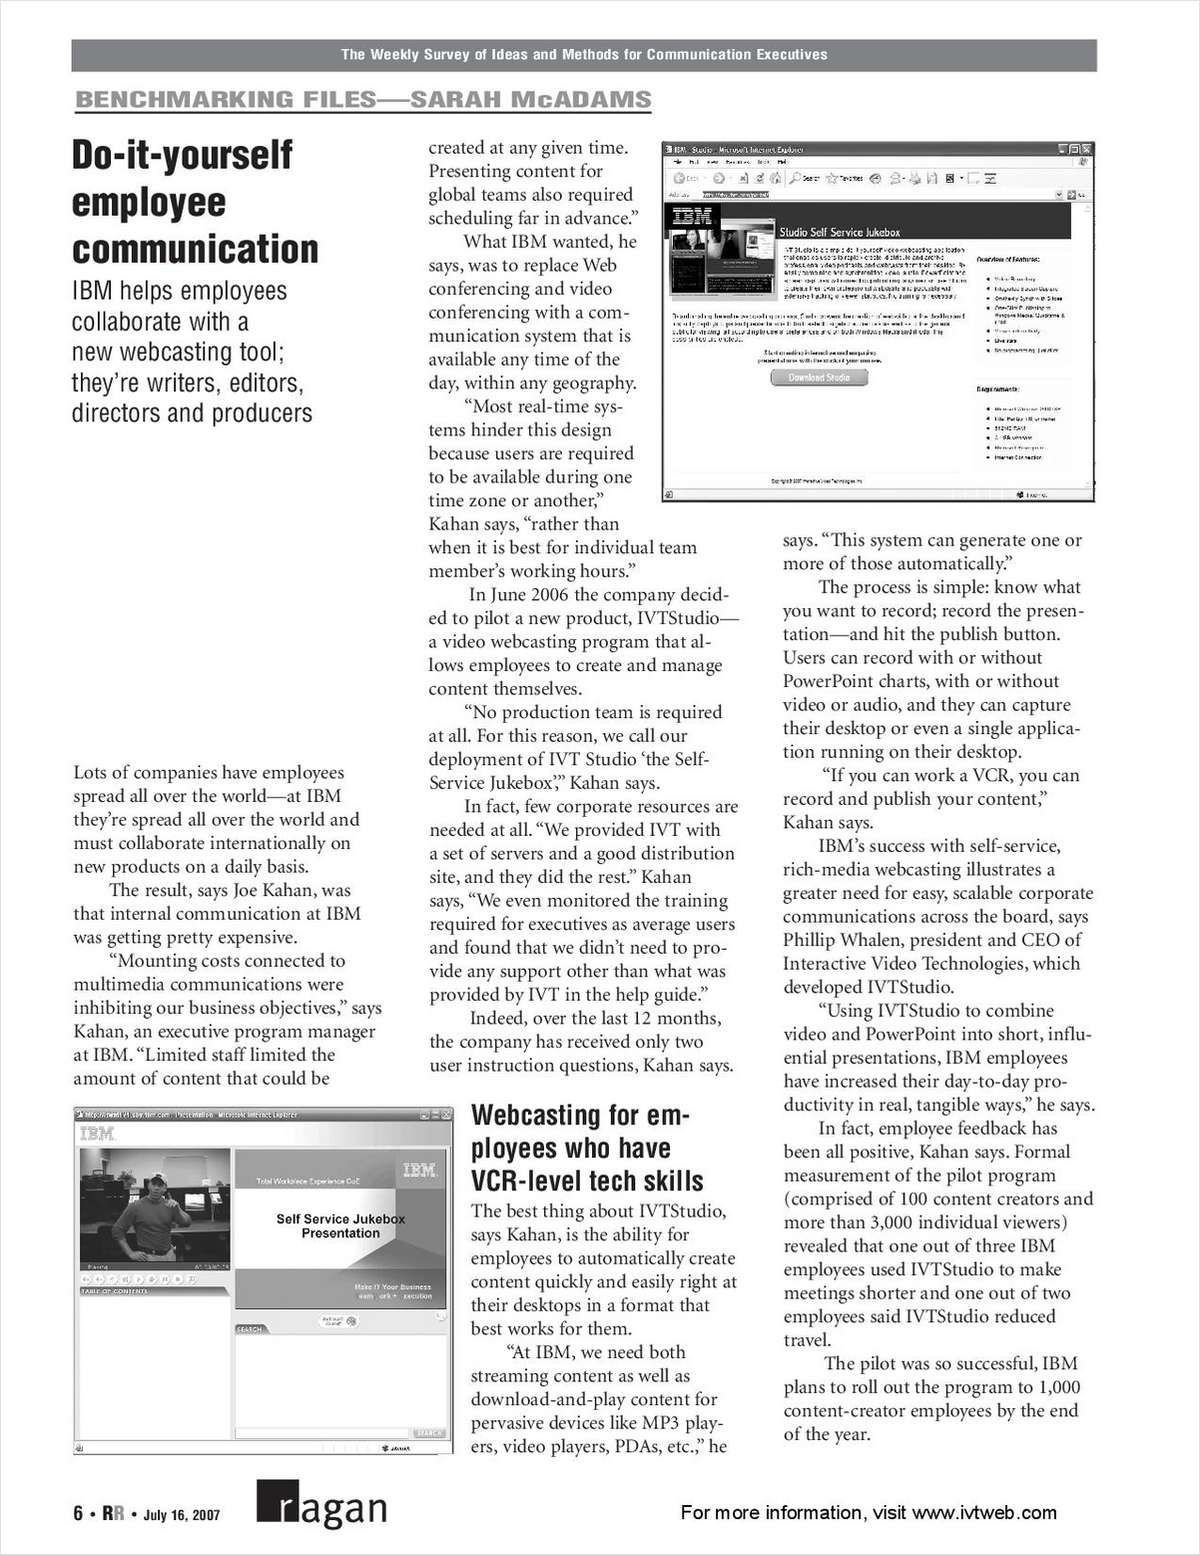 Ragan Report: Do-It-Yourself Video Communication